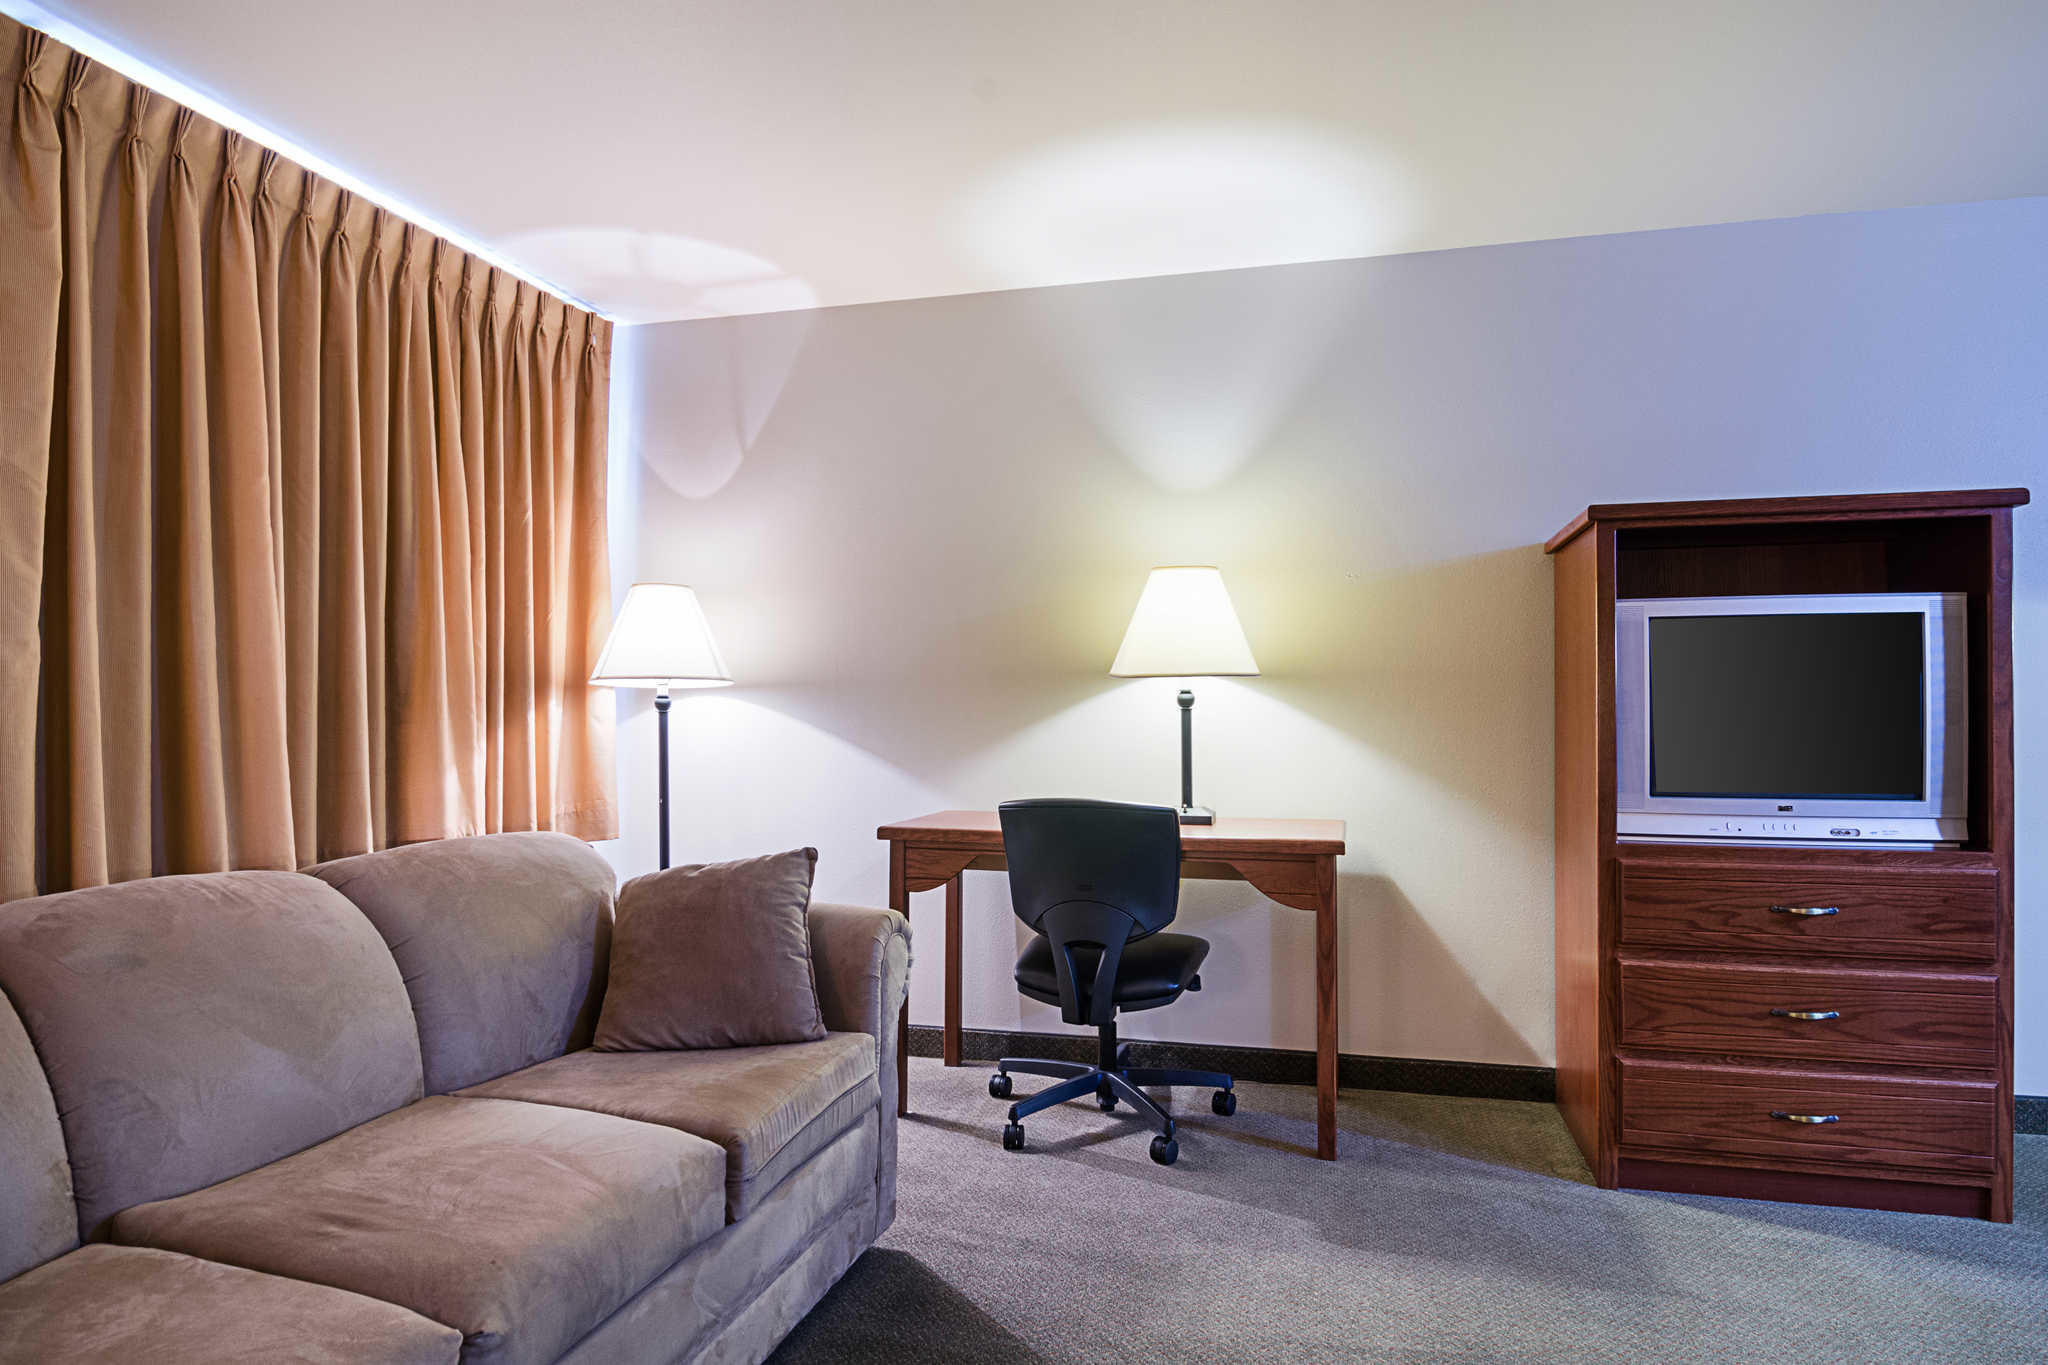 Rodeway Inn image 22